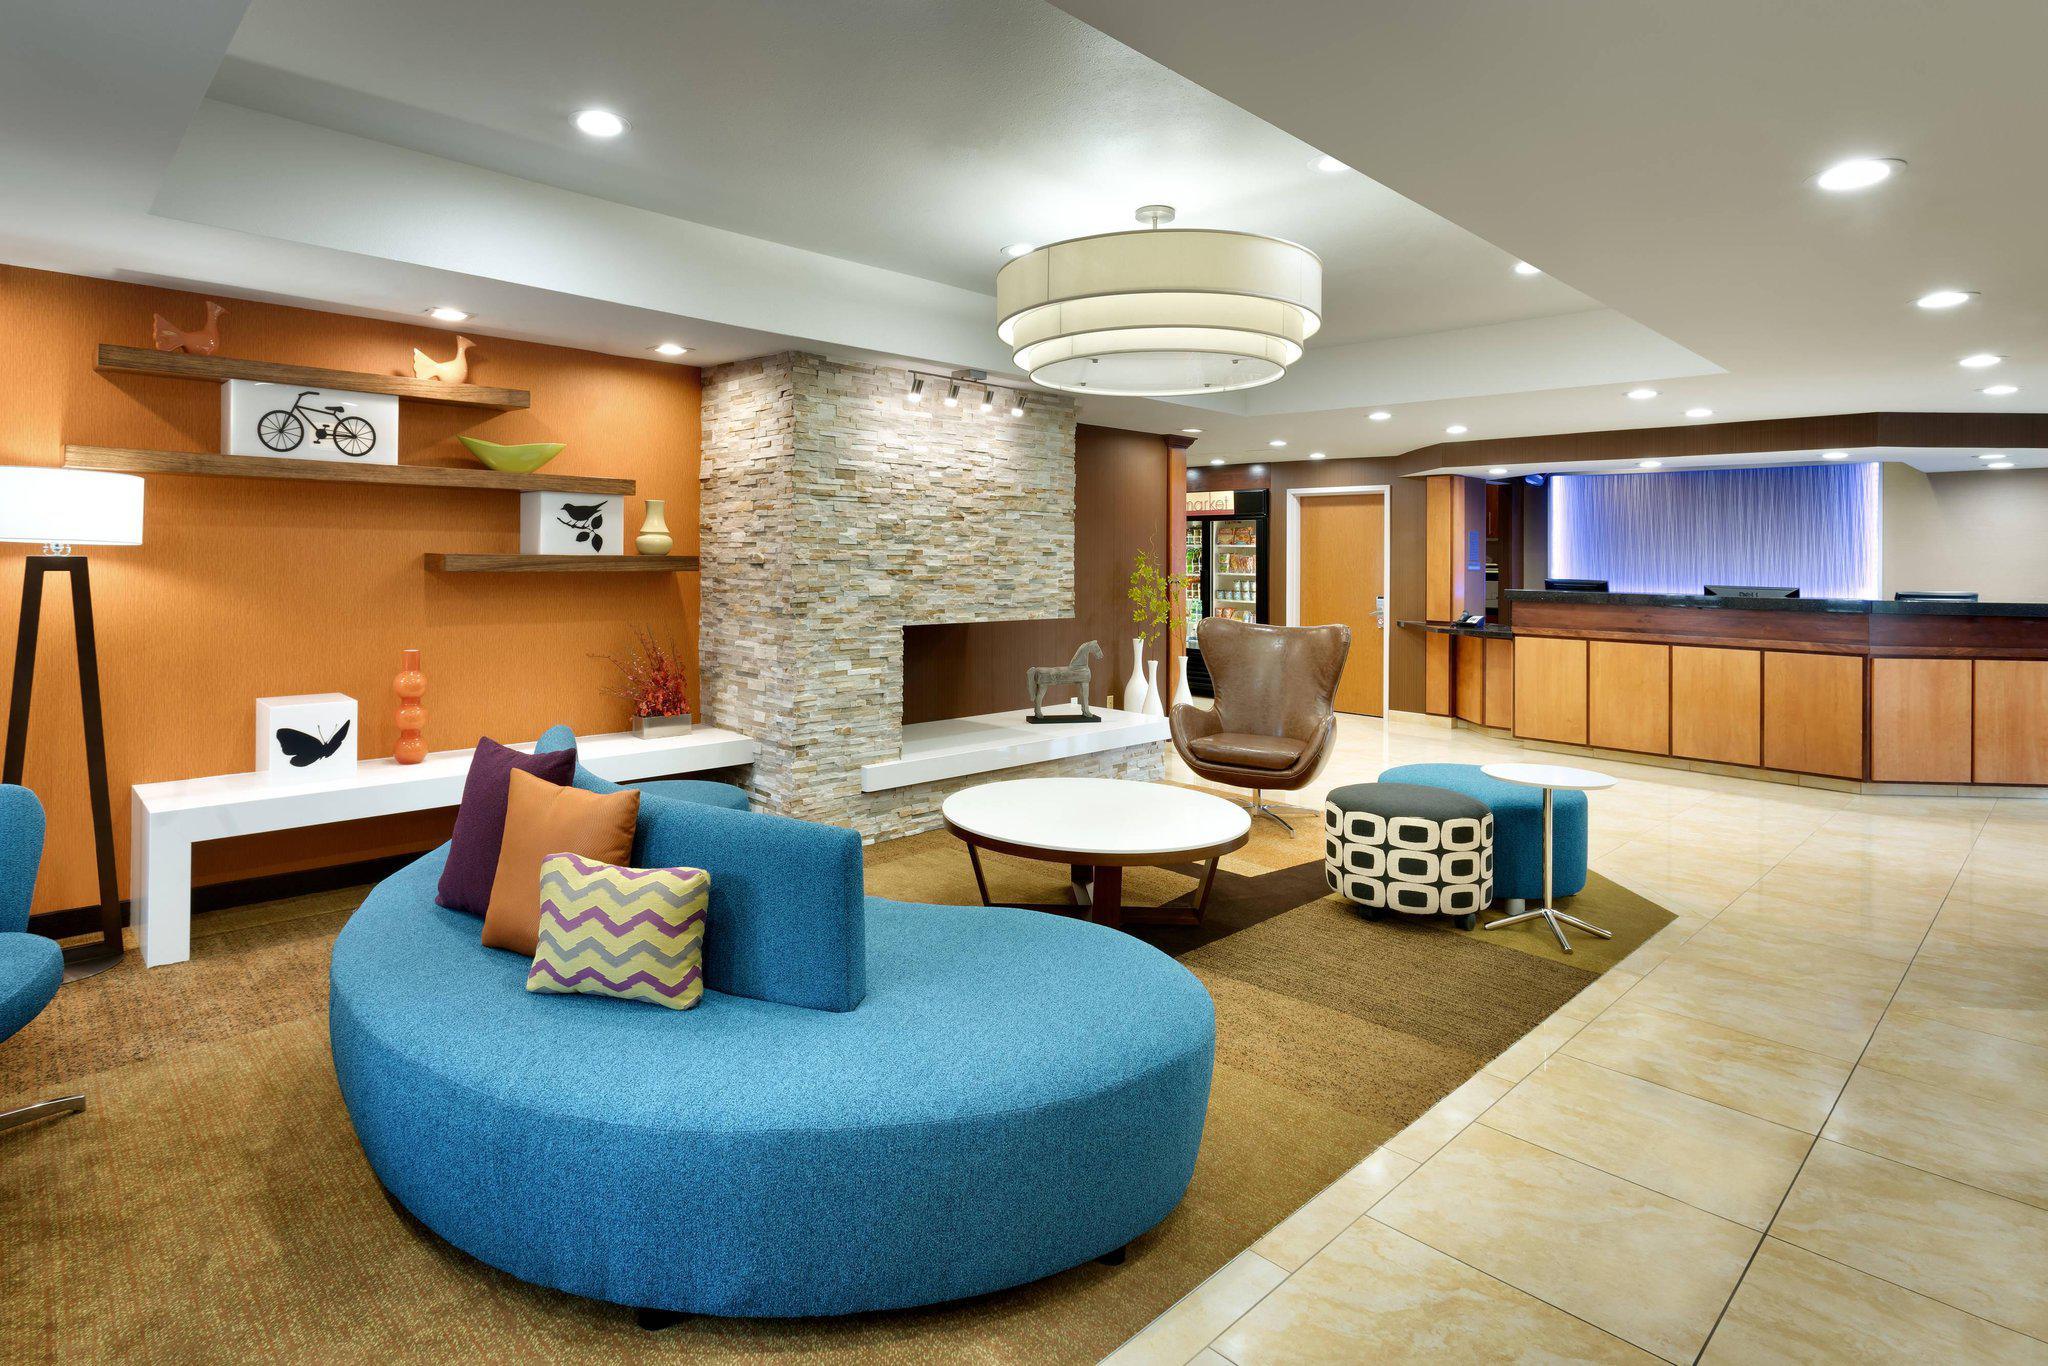 Fairfield Inn & Suites by Marriott Salt Lake City Airport